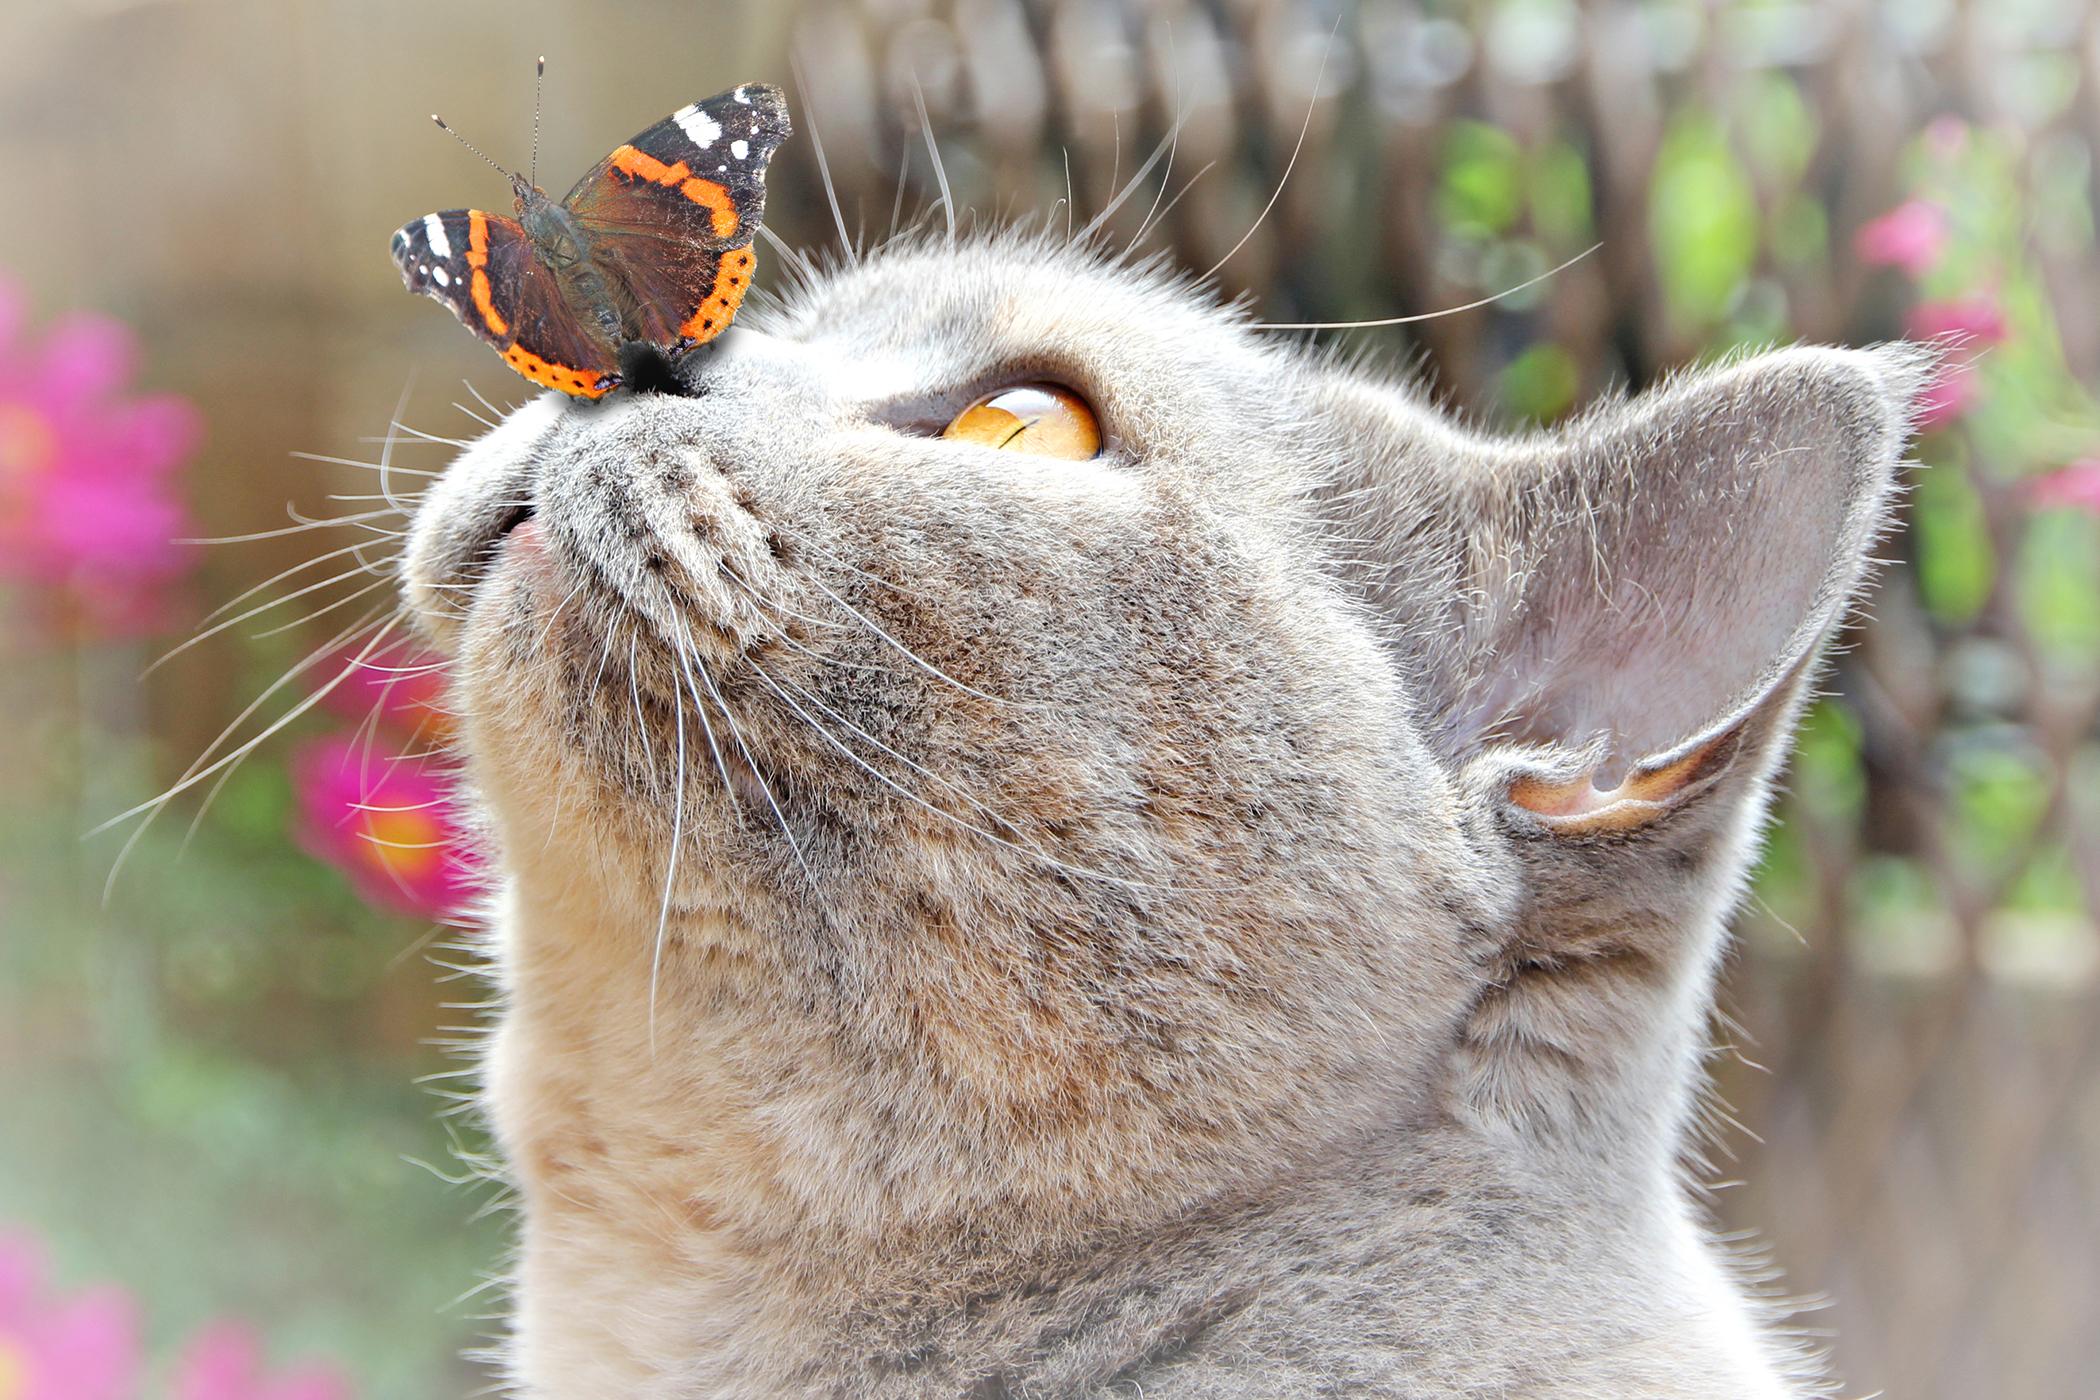 Brachycephalic Syndrome in Cats